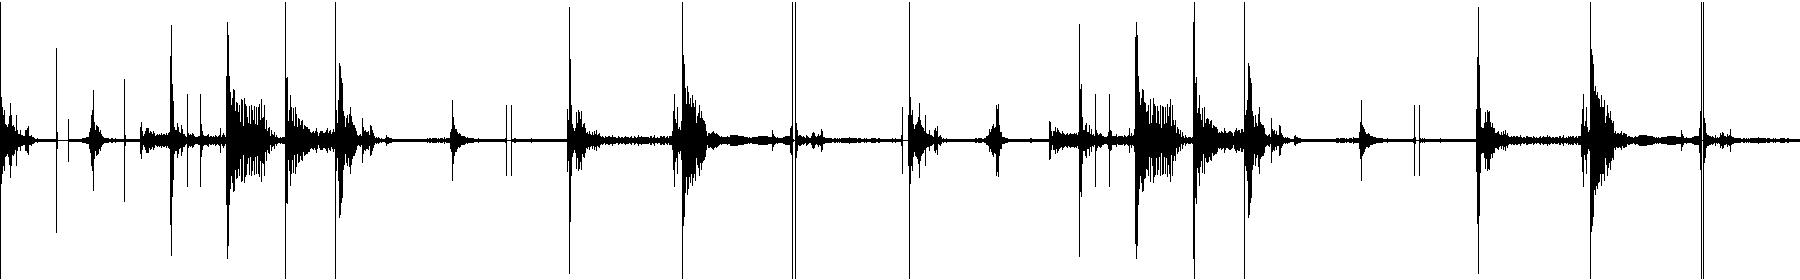 shg percussion loop 20